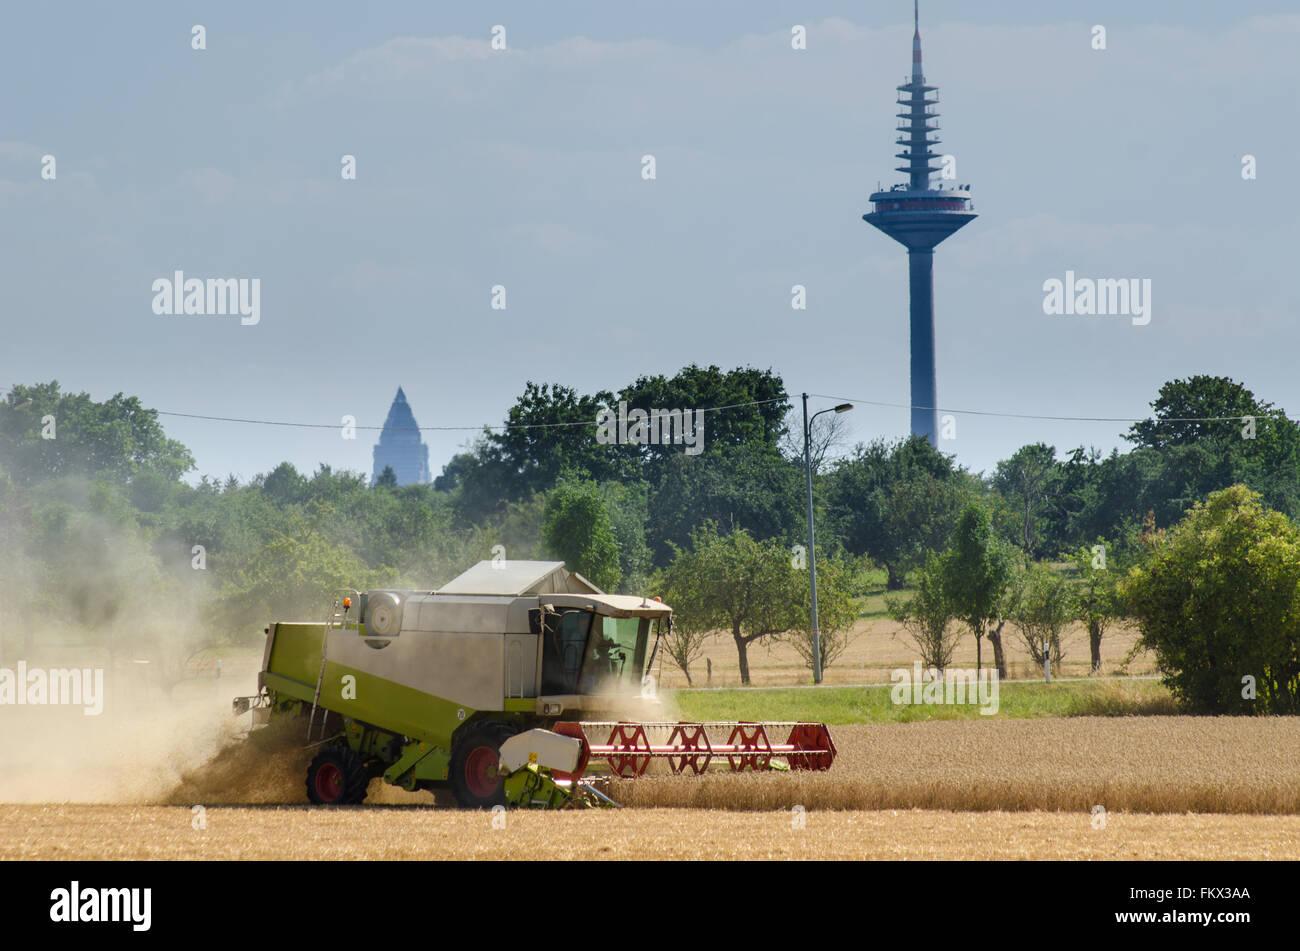 Harvesting harvester near city - Stock Image